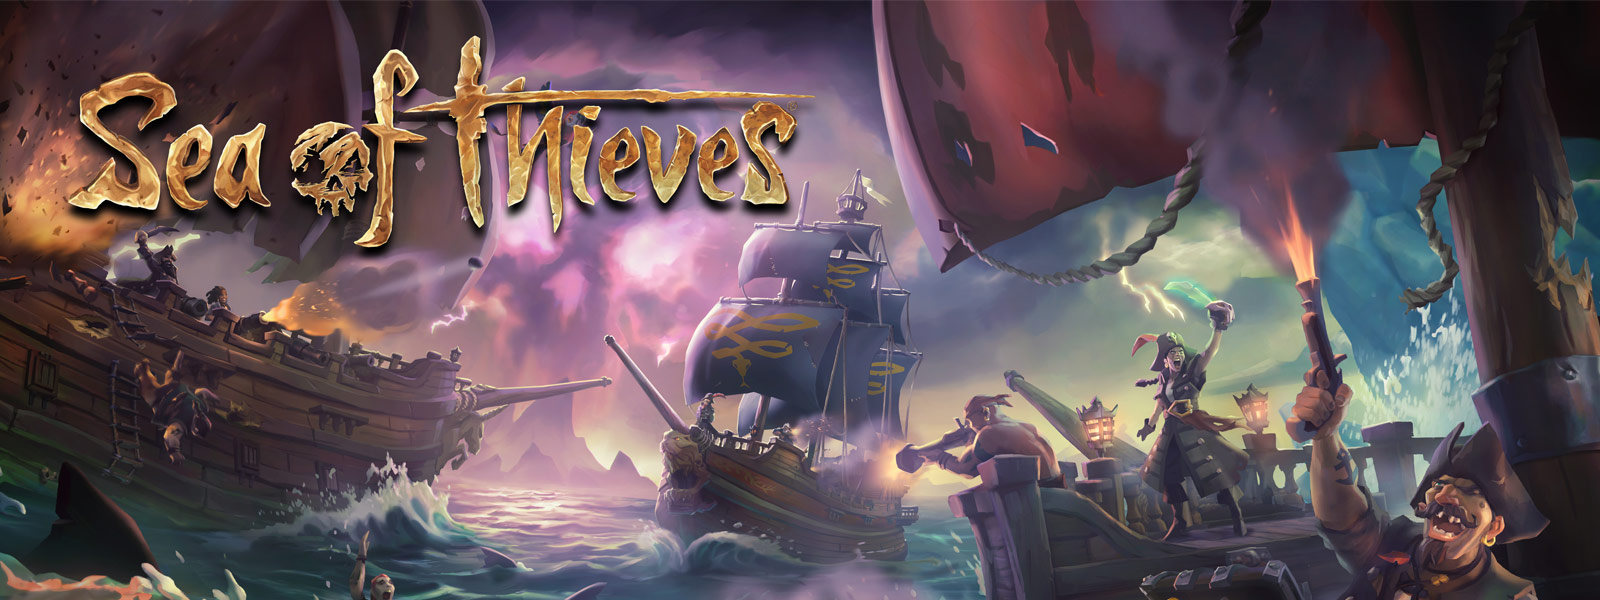 Sea of Thieves - Μάχη πλοίων στη θάλασσα και μια βάρκα πυροβολεί άλλα πλοία